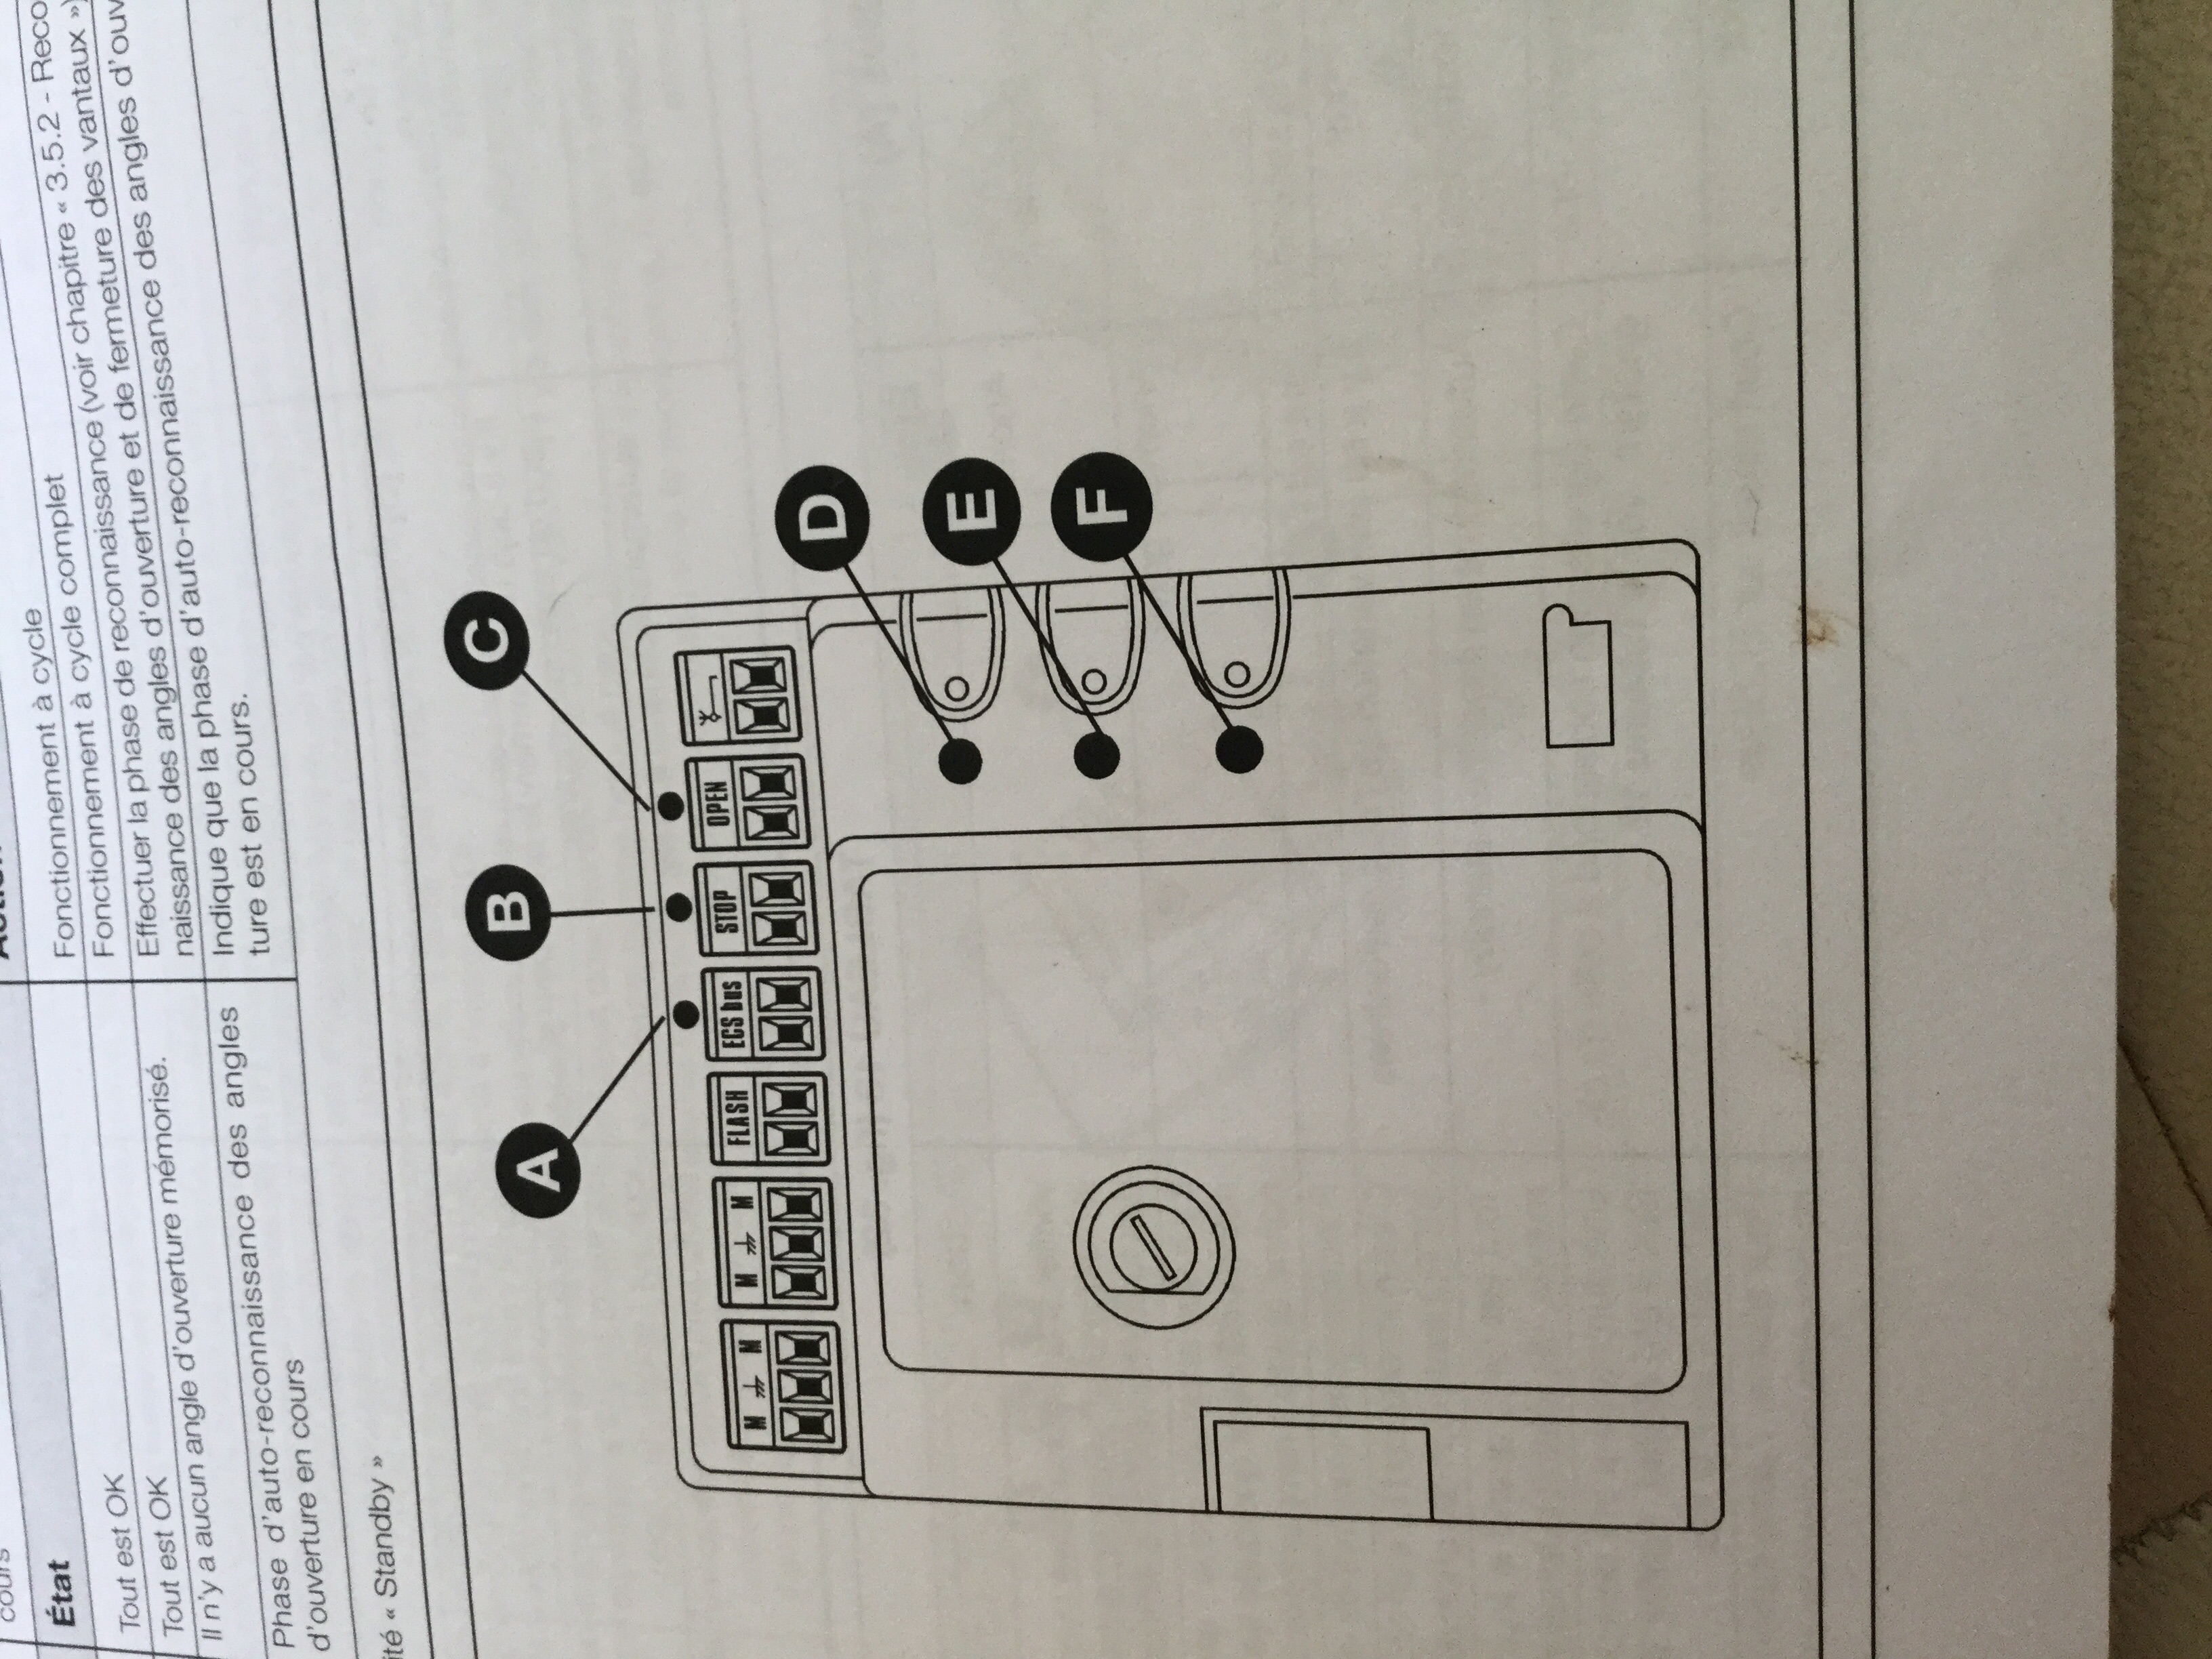 sch ma de c blage motorisation portail nice avec r ponse s. Black Bedroom Furniture Sets. Home Design Ideas